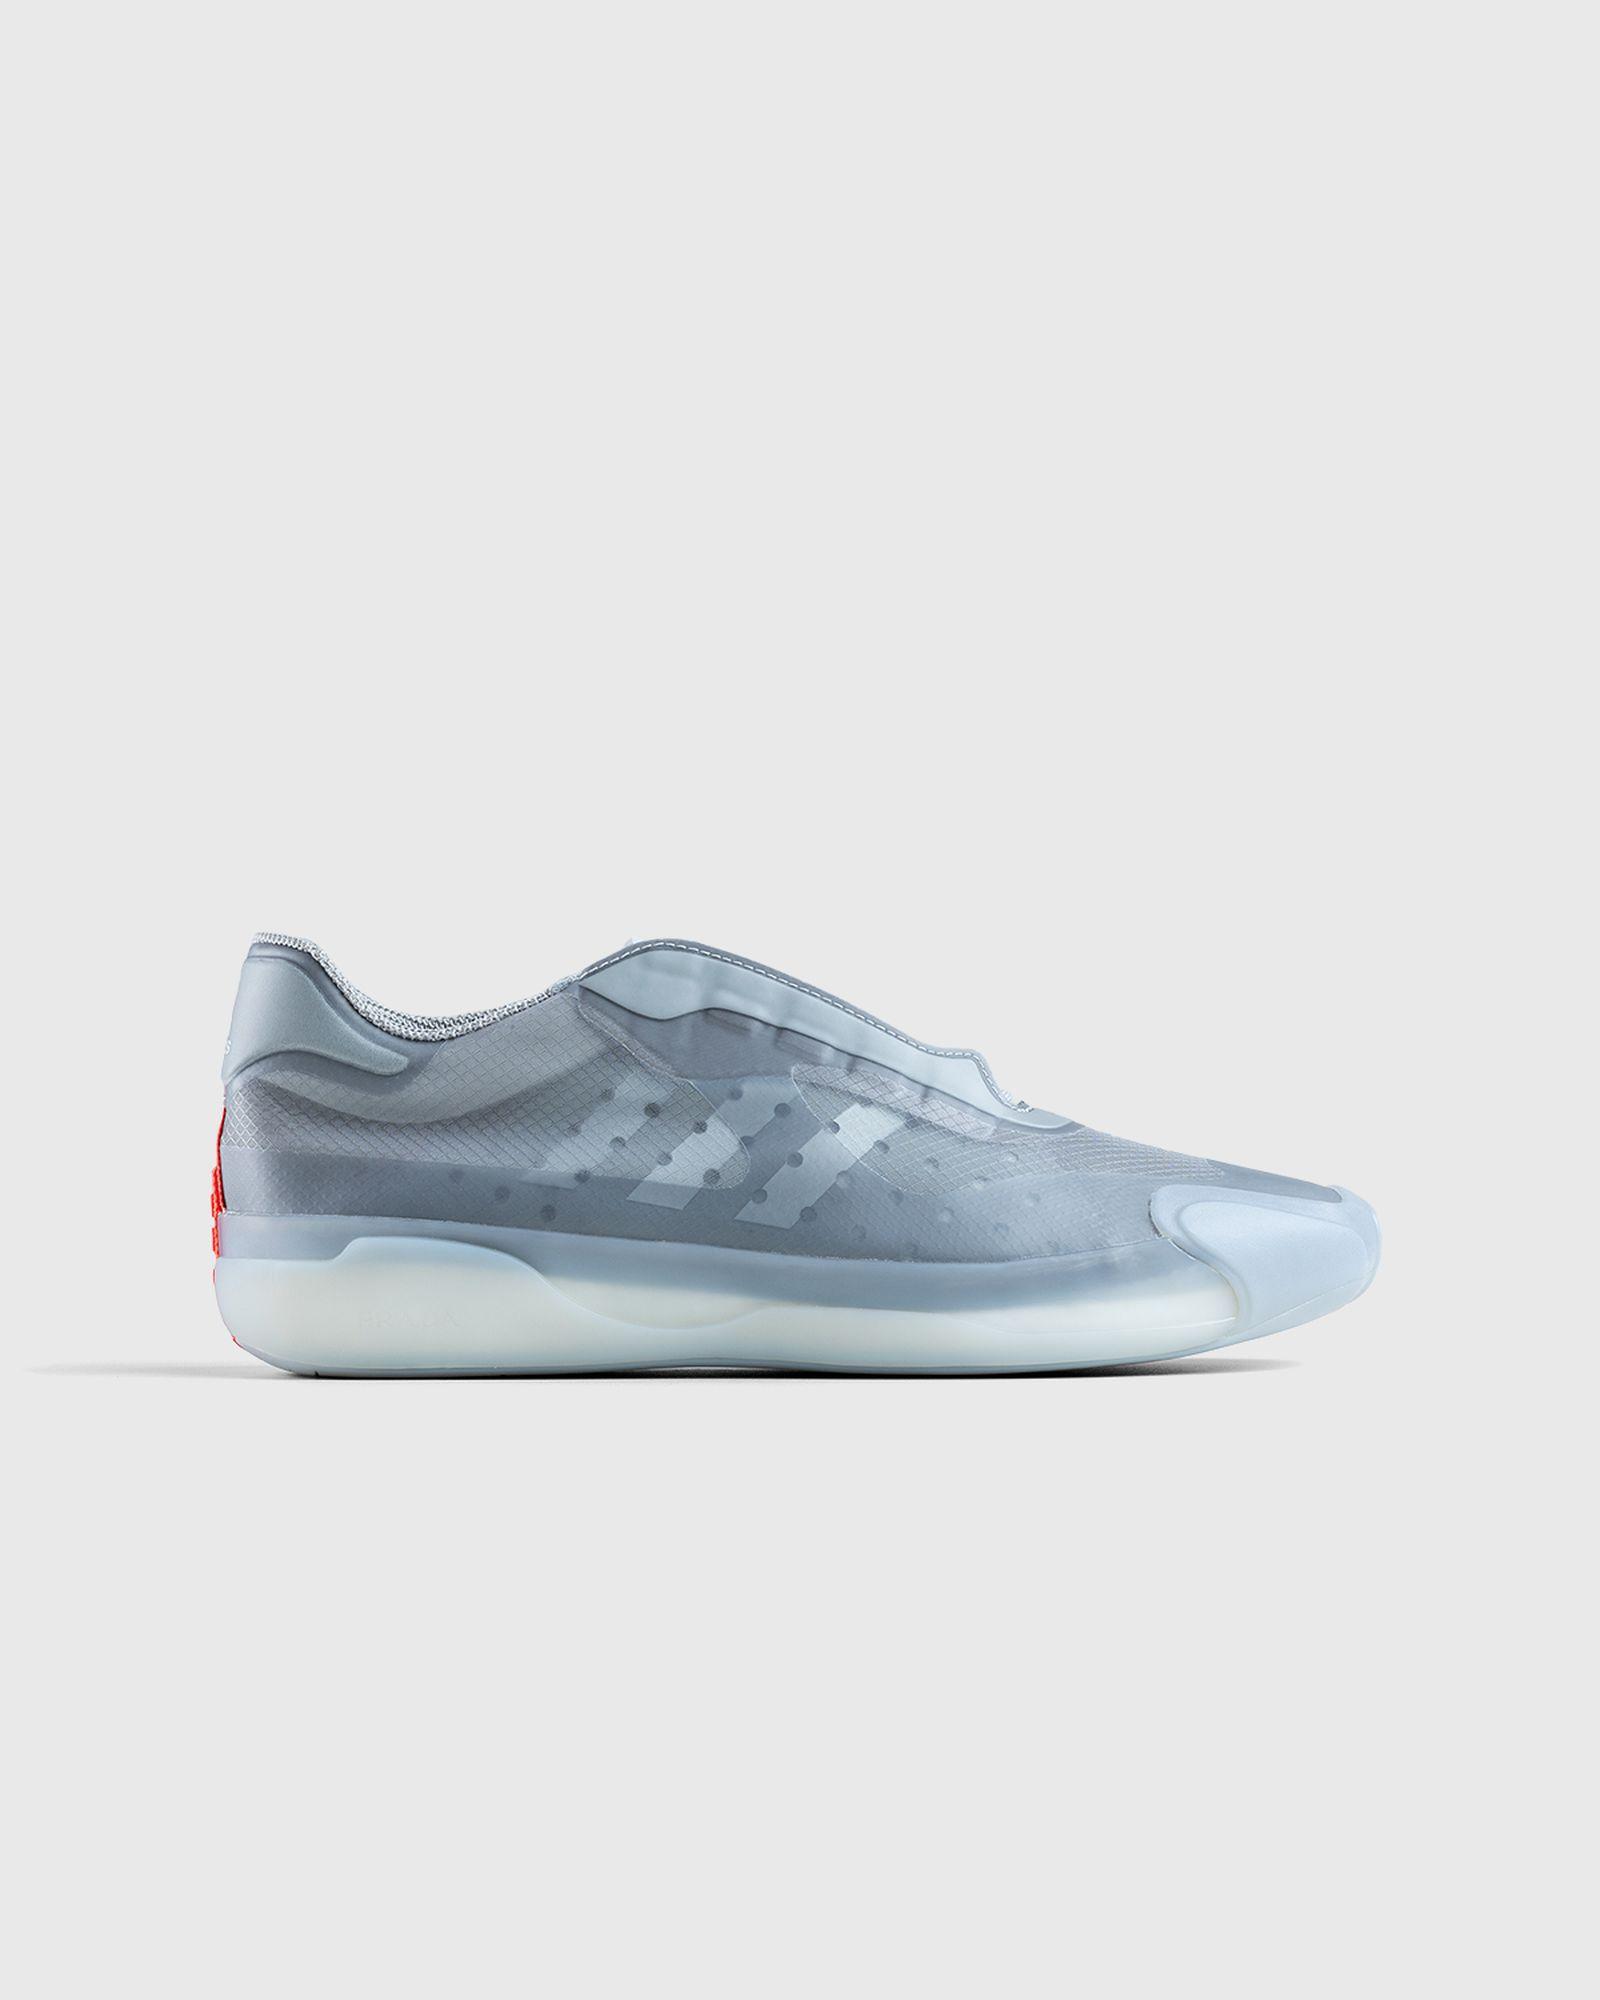 adidas-prada-luna-rossa-replica-grey-release-date-price-1